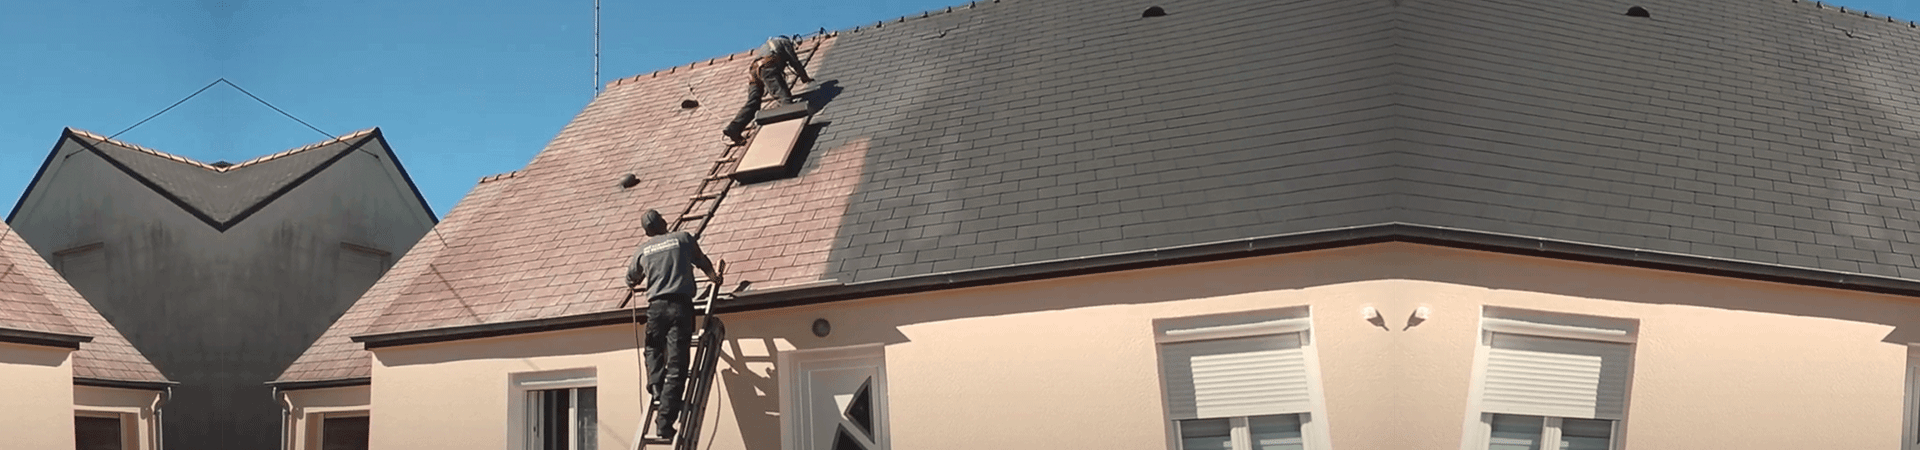 Assainissement de toiture